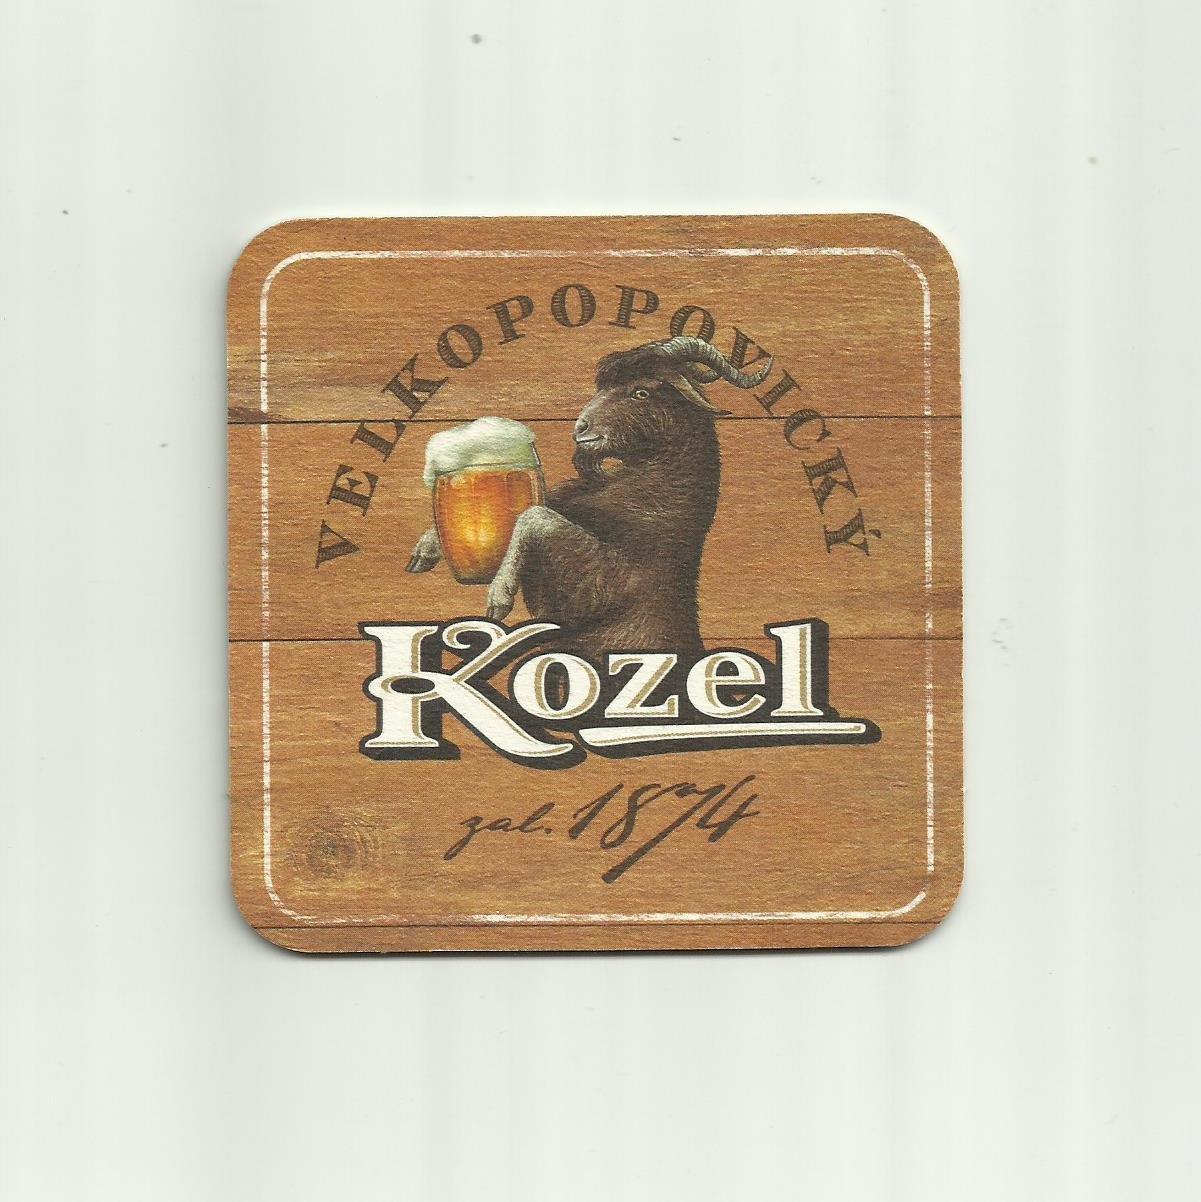 CZECH KOZEL LAGER BEER MAT COASTER